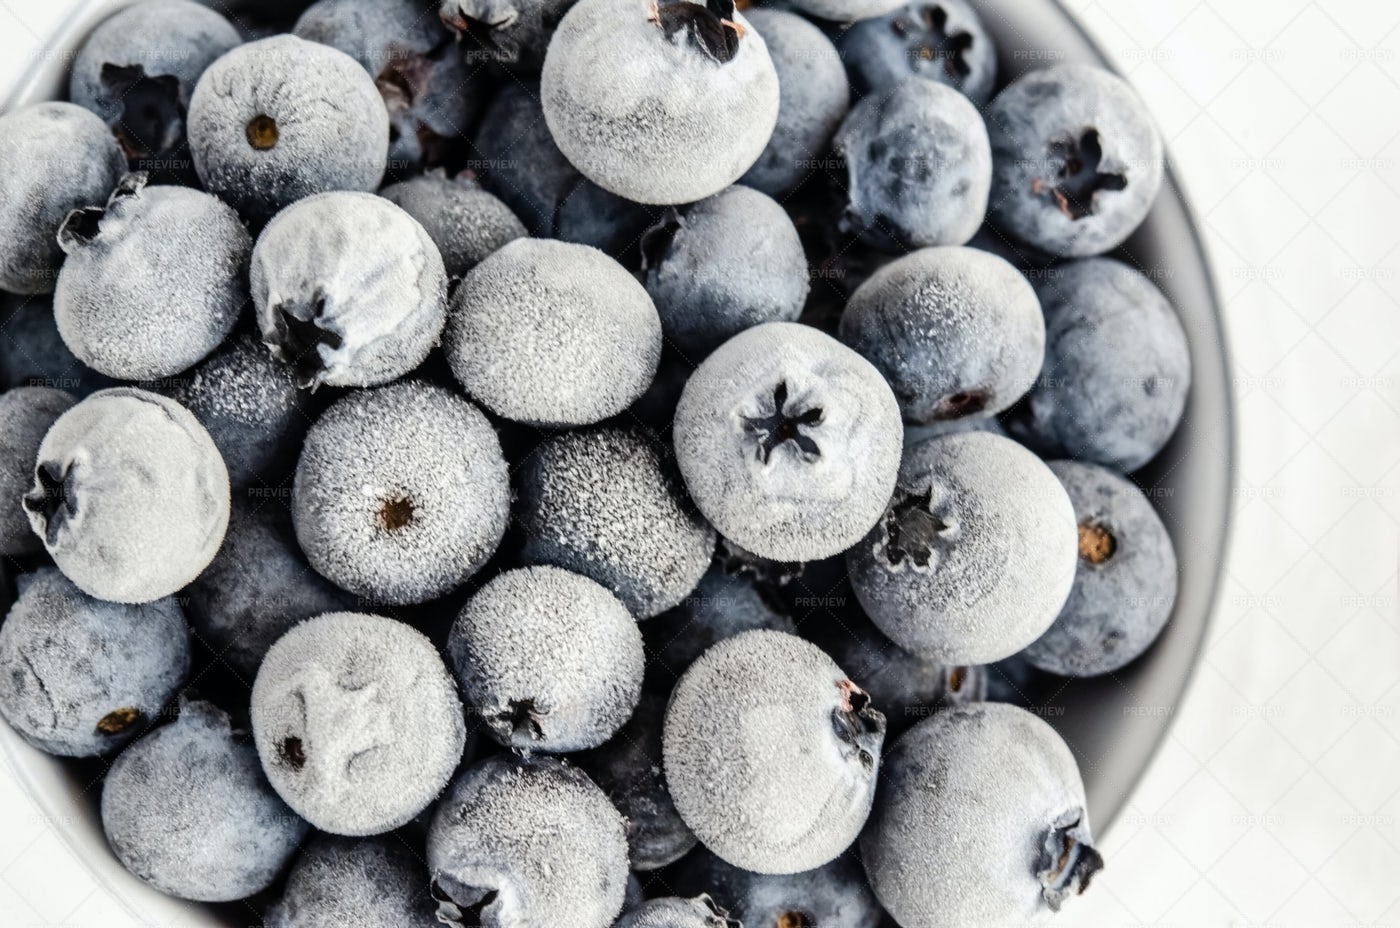 Frozen Blueberries: Stock Photos